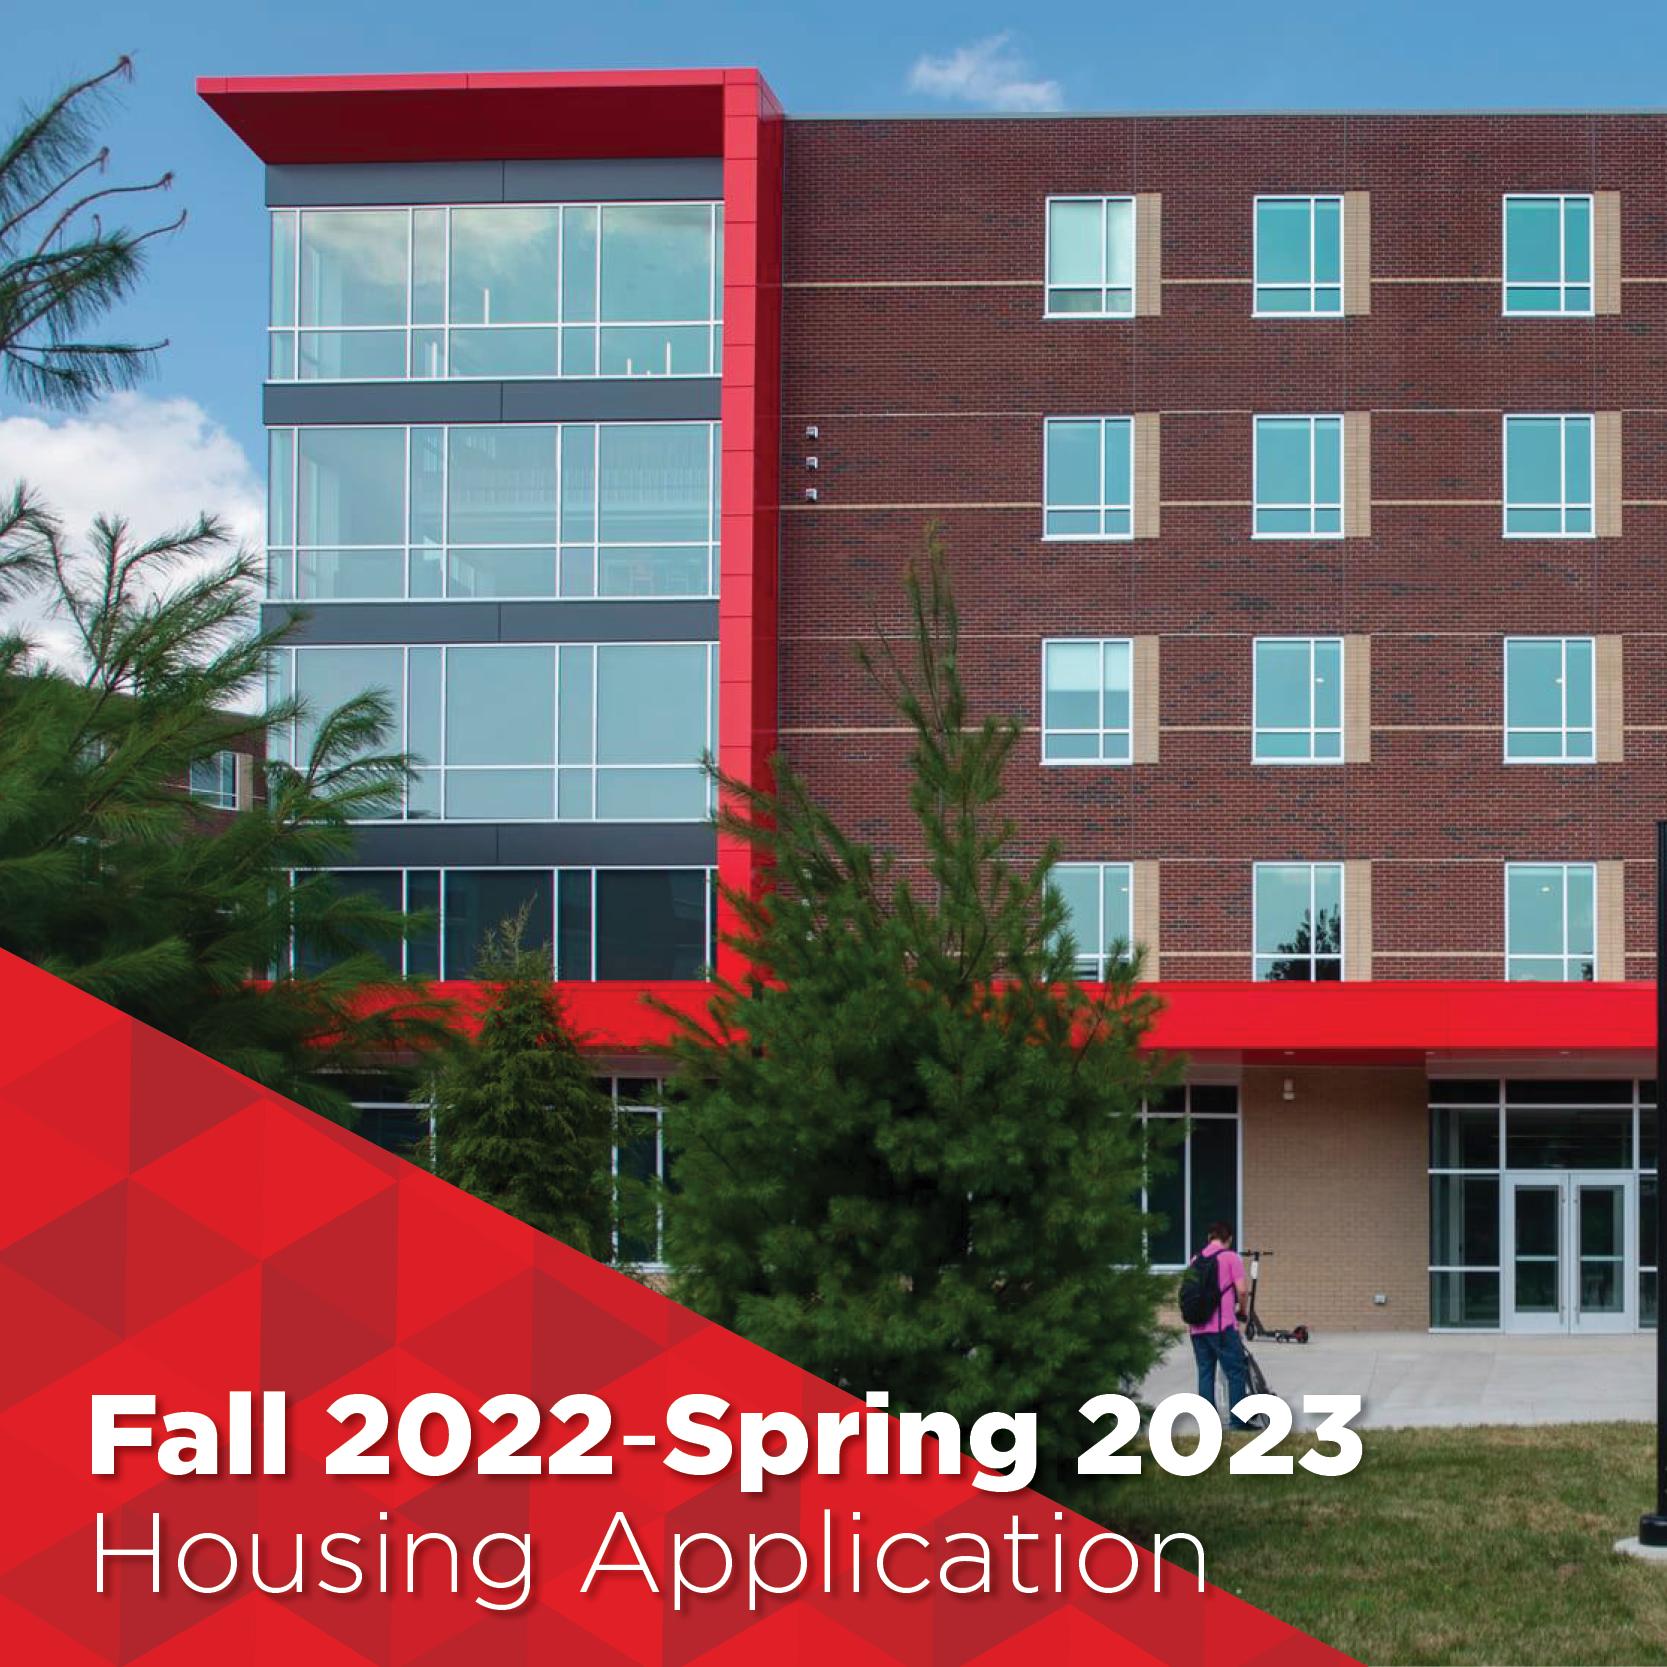 fall 2022 housing application